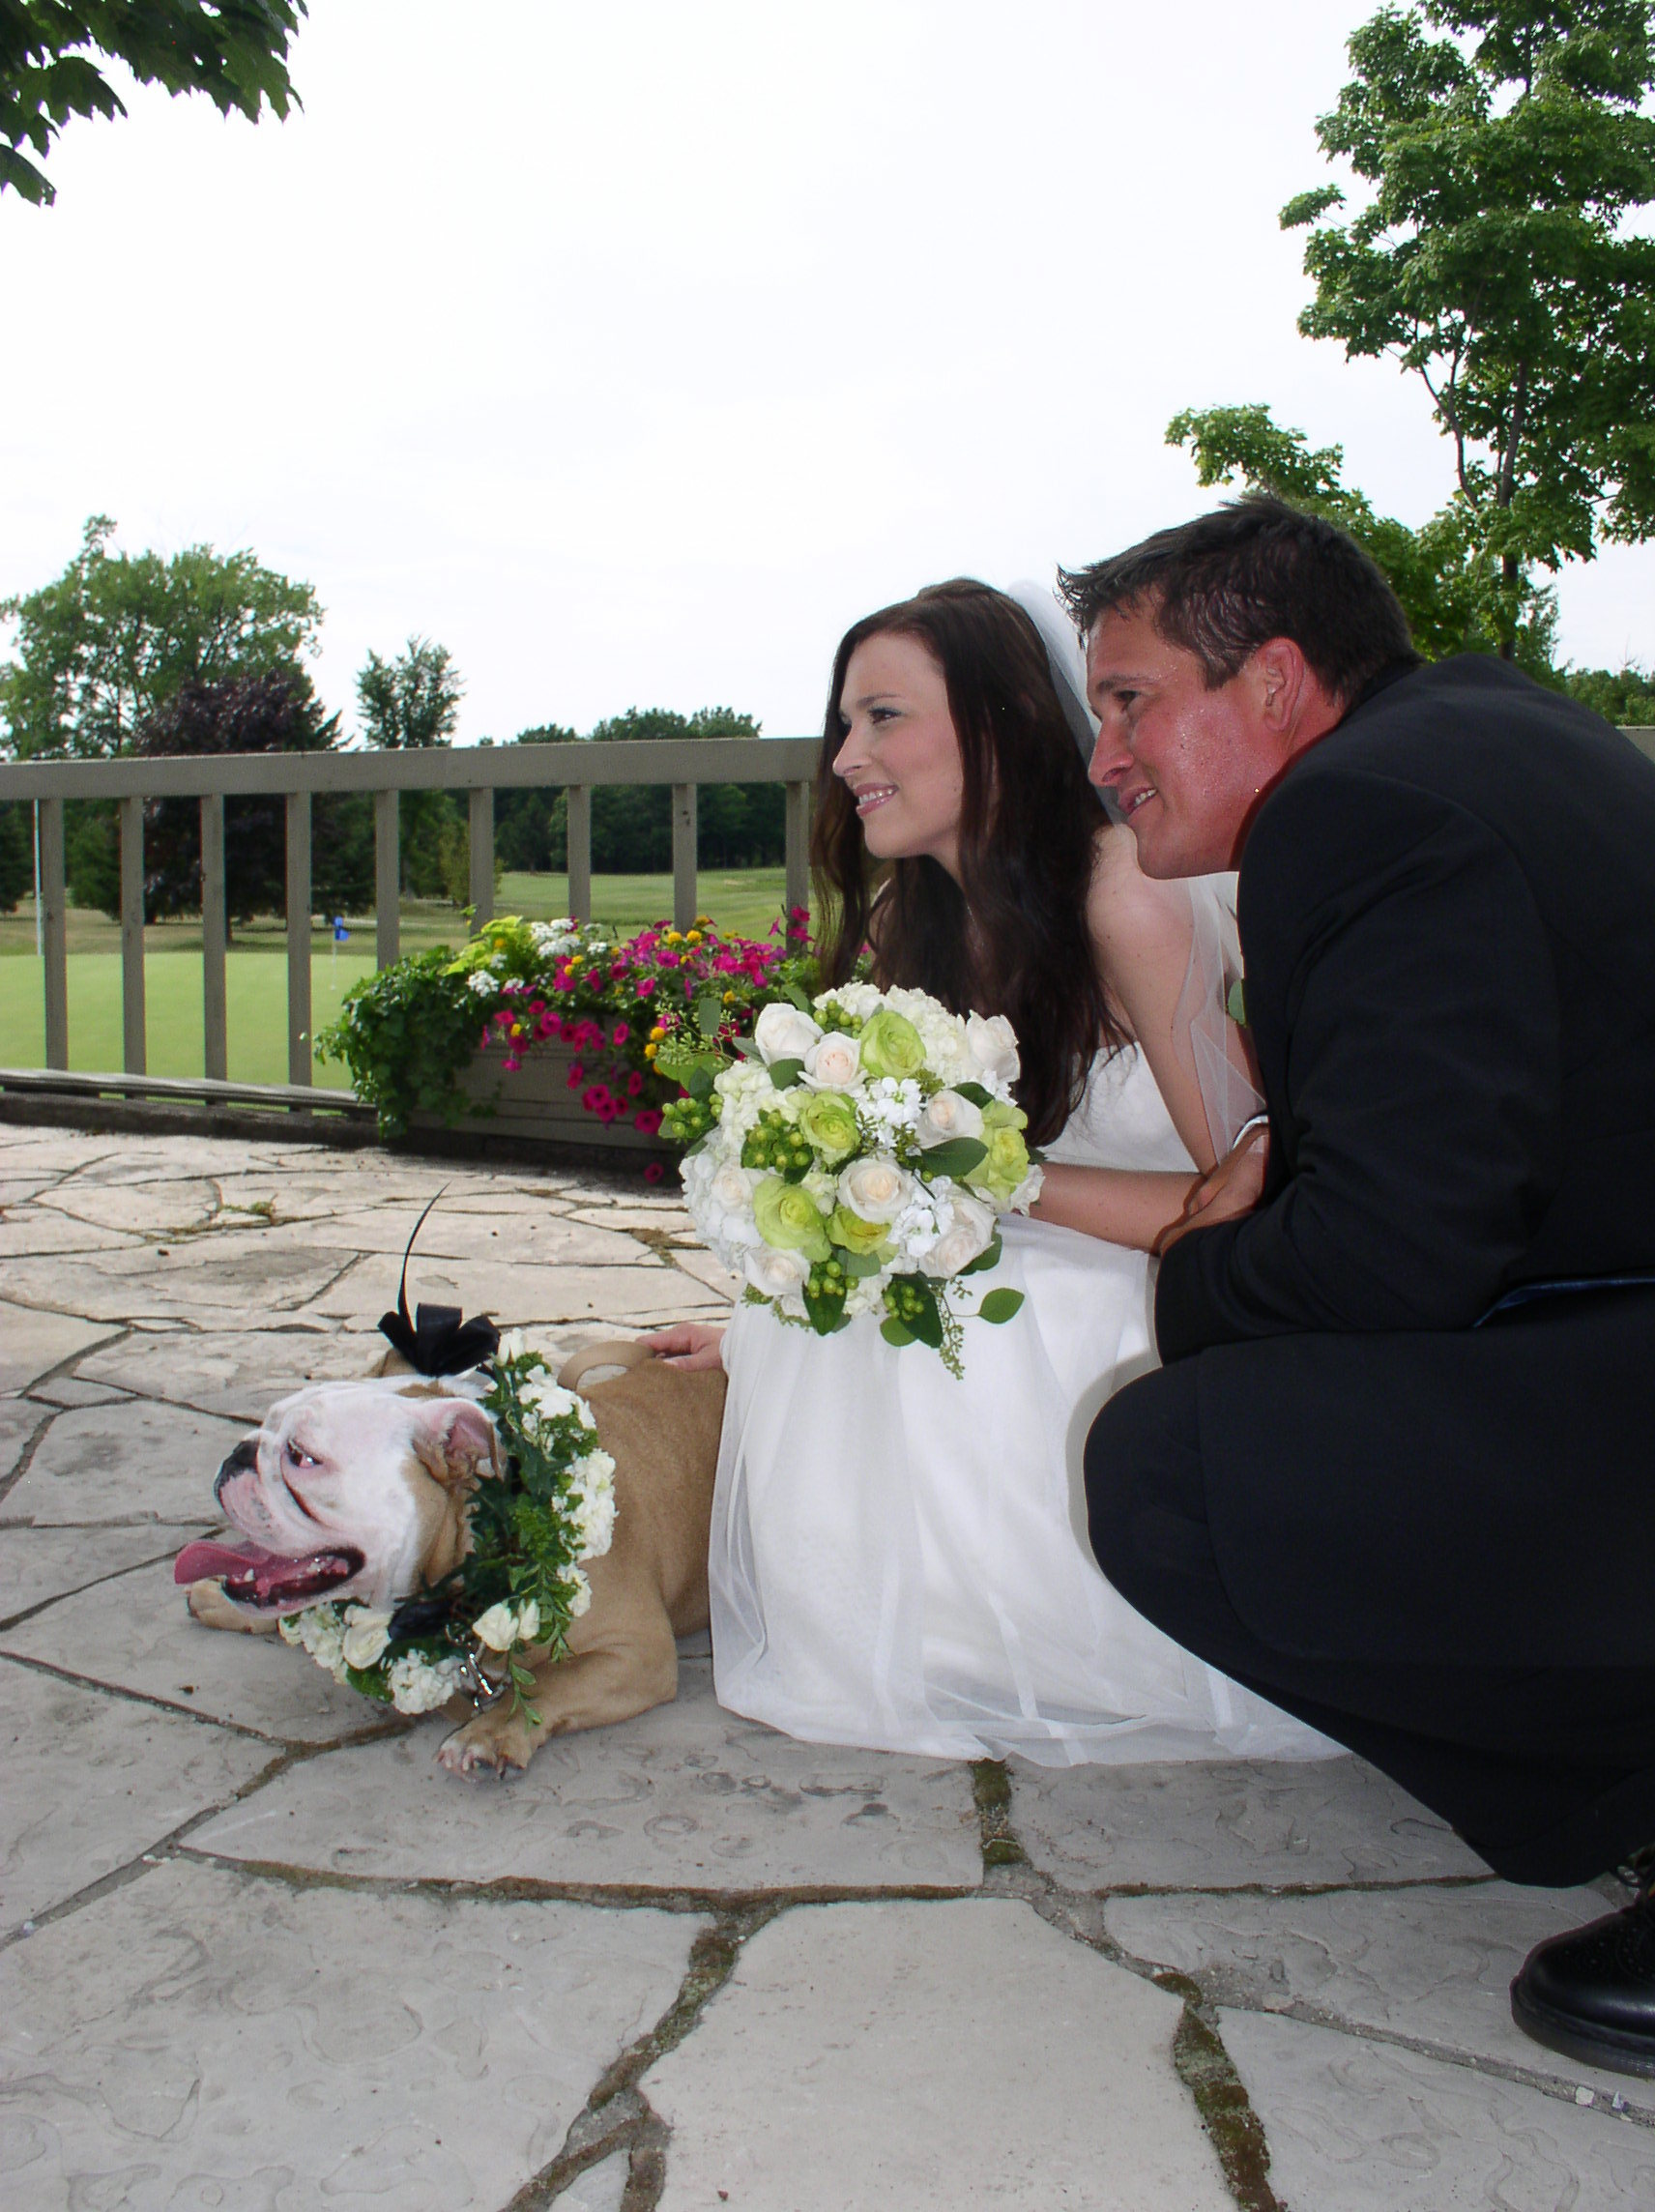 Flowers & Decor, Bride Bouquets, Flowers, Brides, Dog, The flower alley